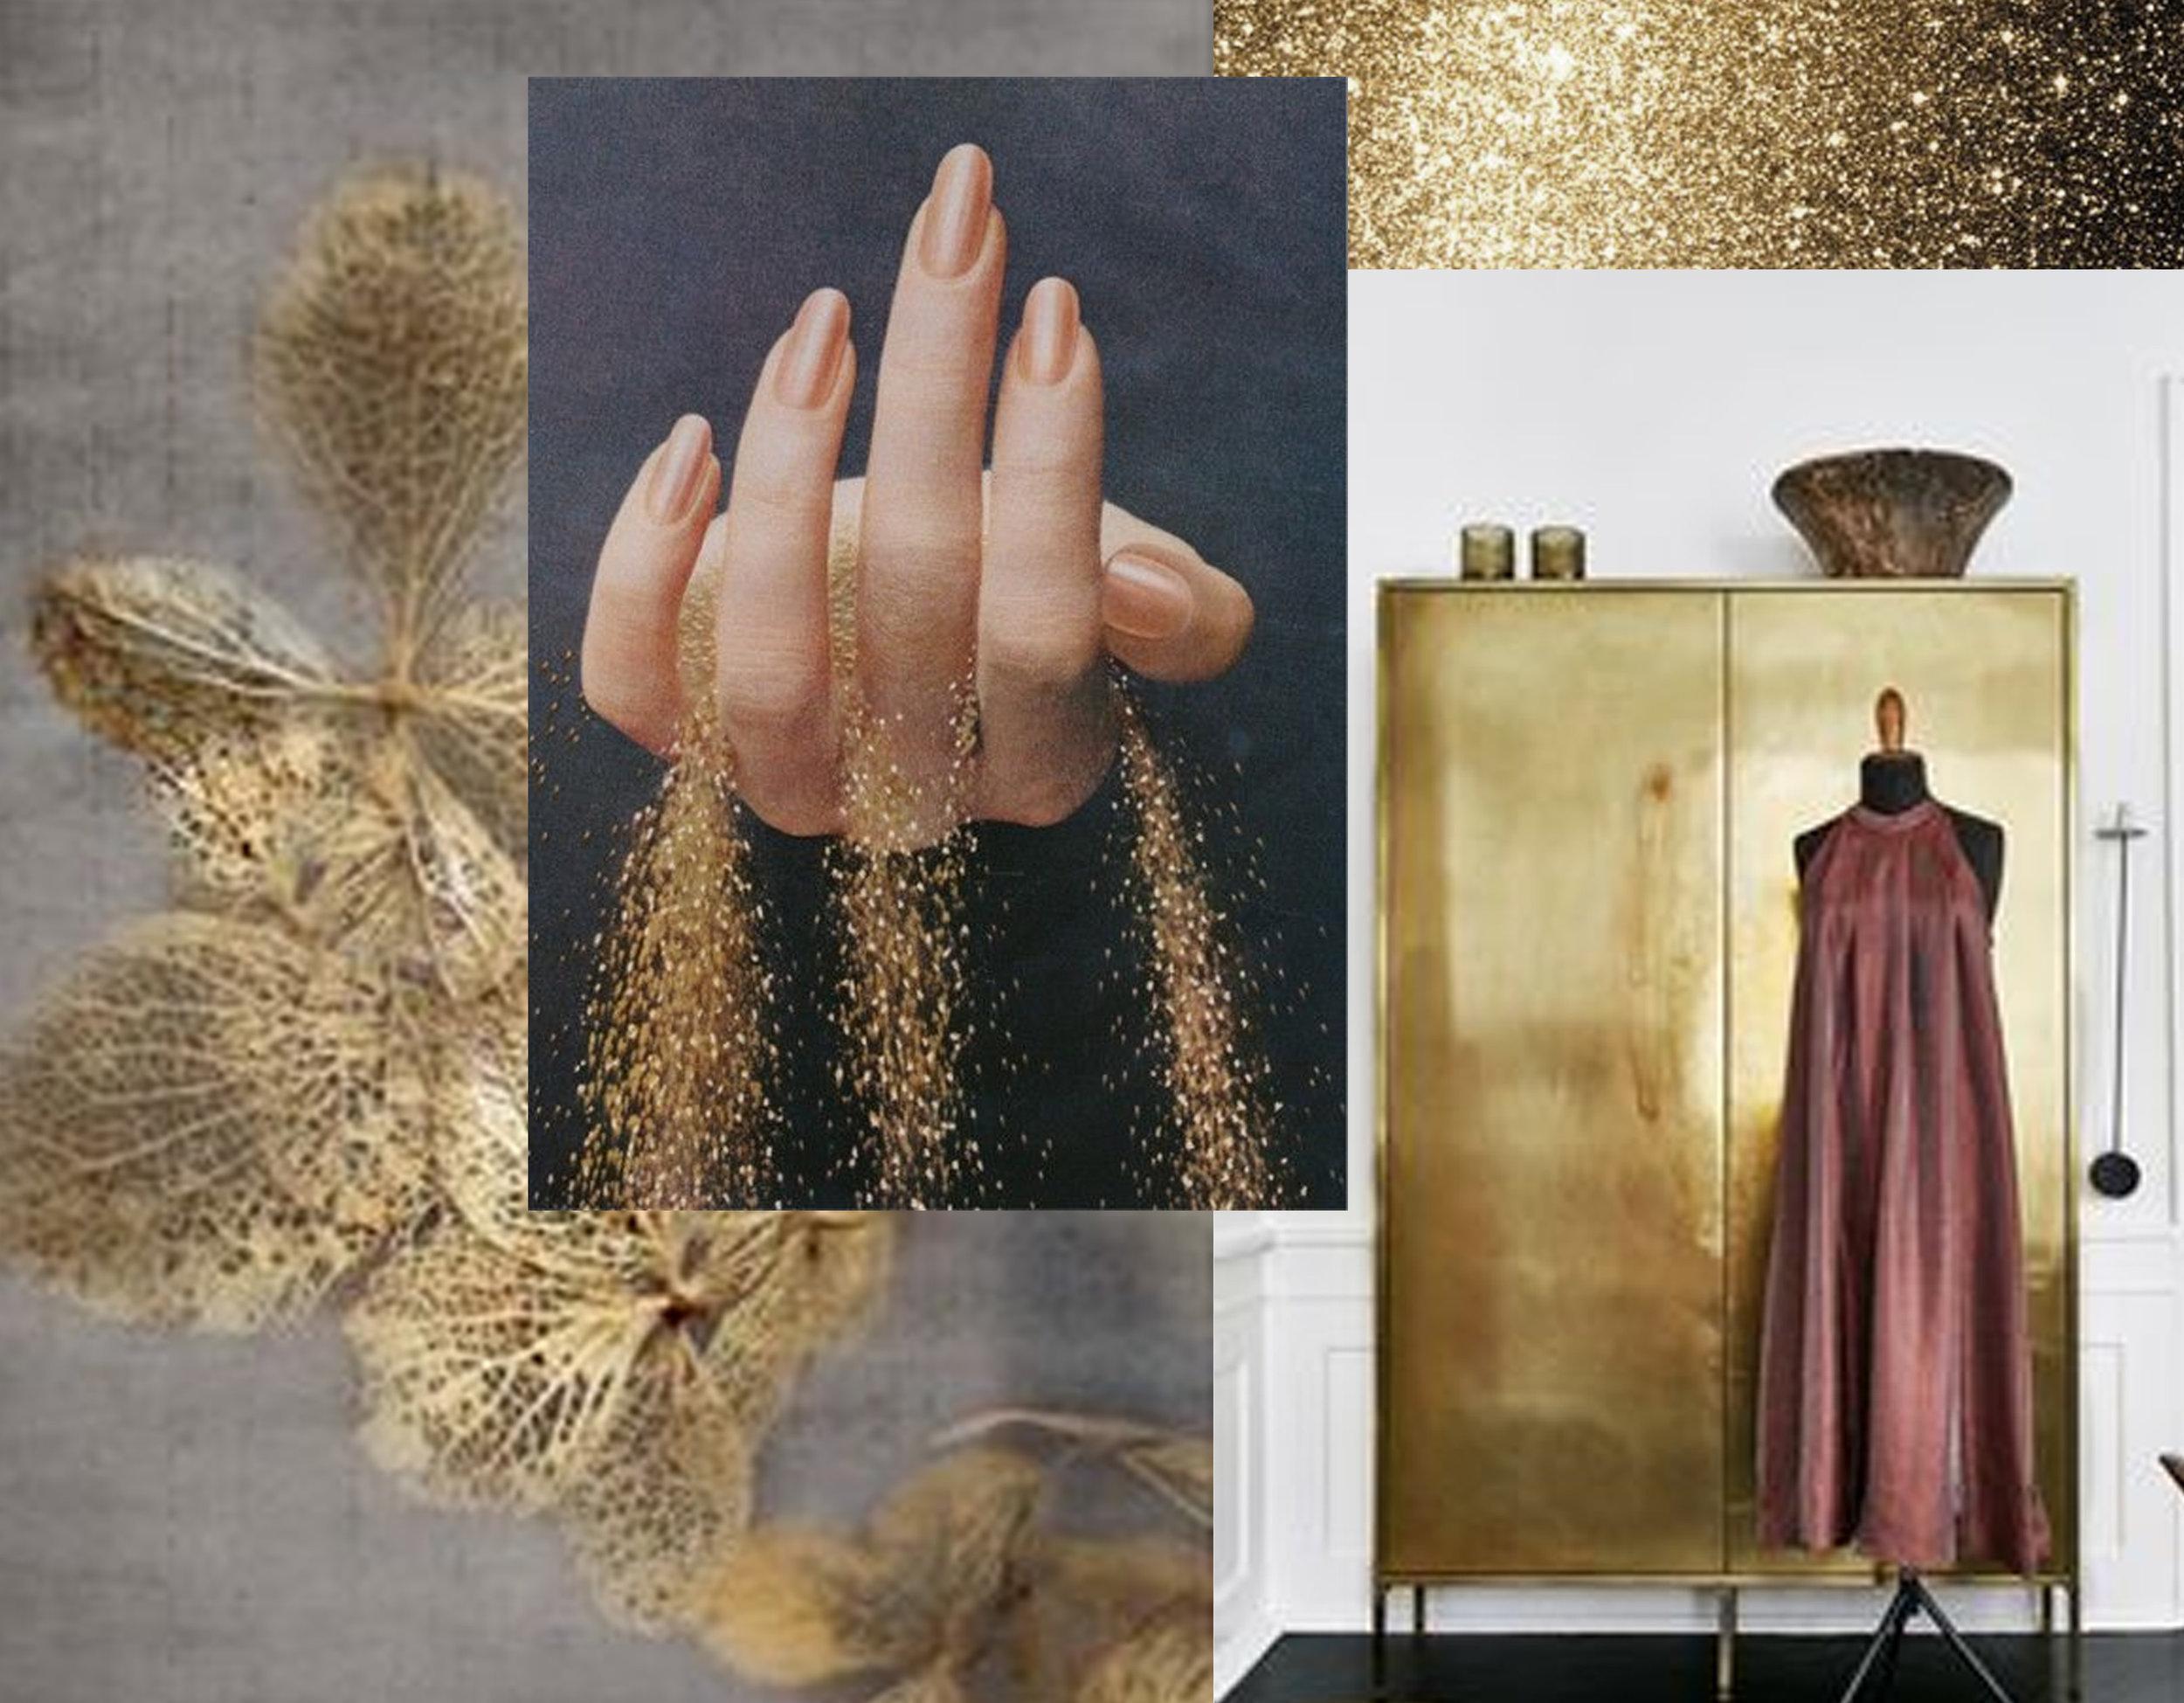 gold flowers  Pinterest  - gold glitter via  Snap Magazine  - golden closet via  Daily Dream Decor